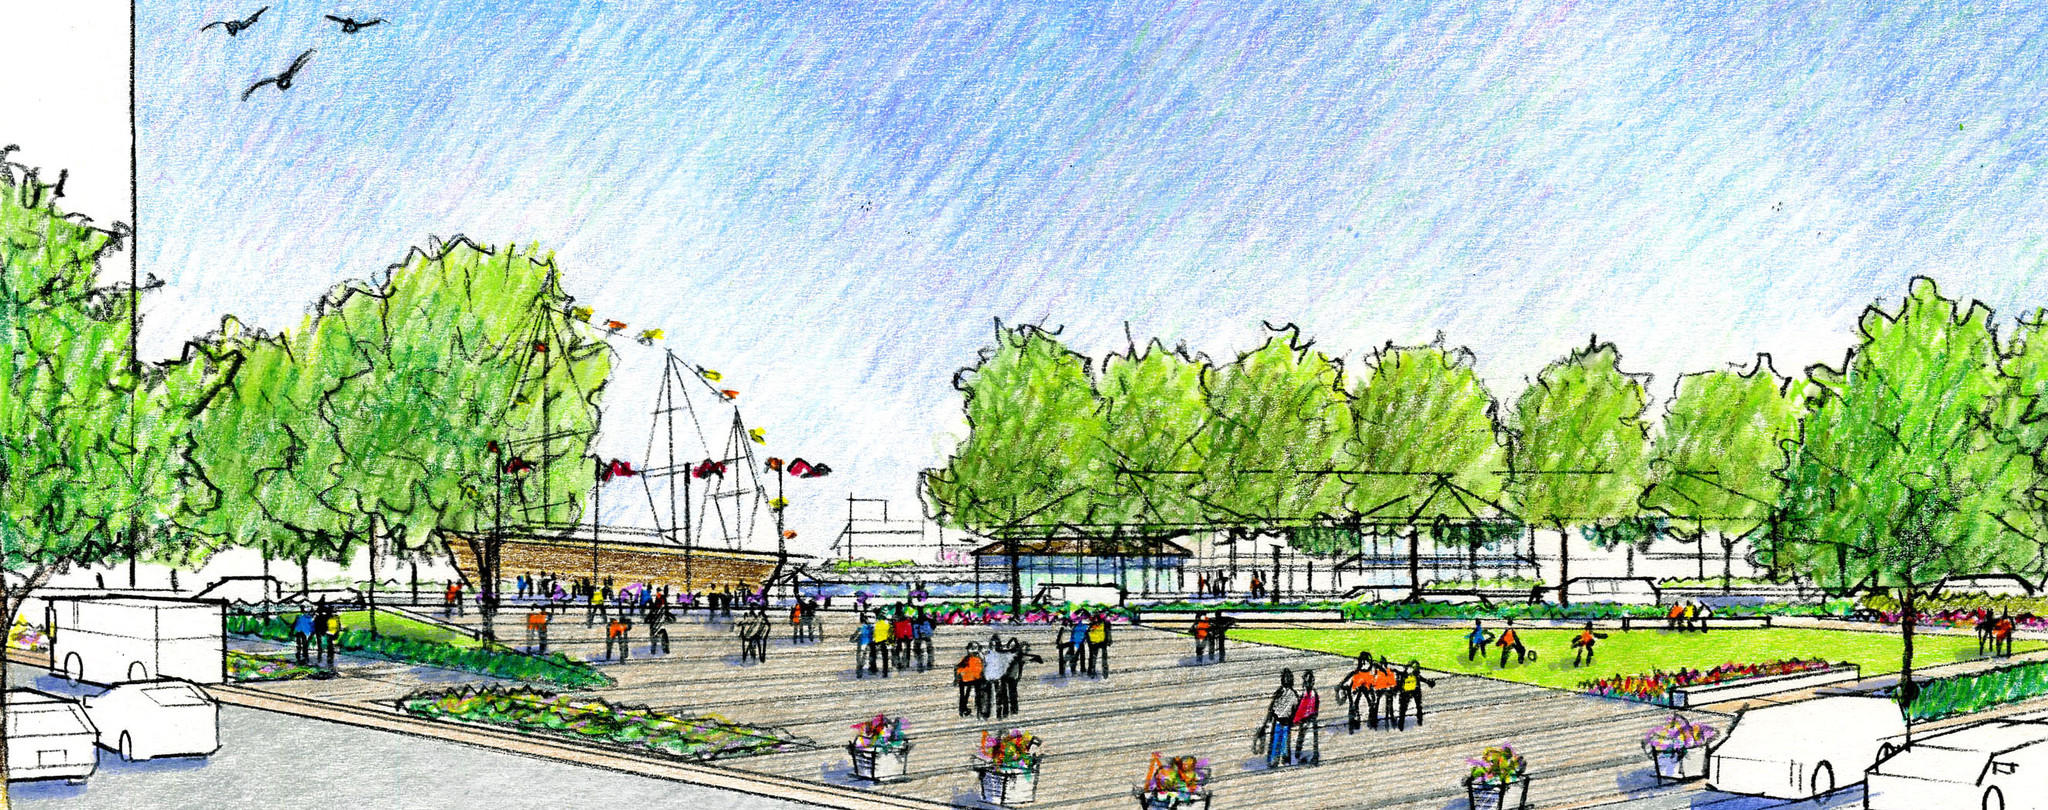 Rendering of a revamped McKeldin Plaza